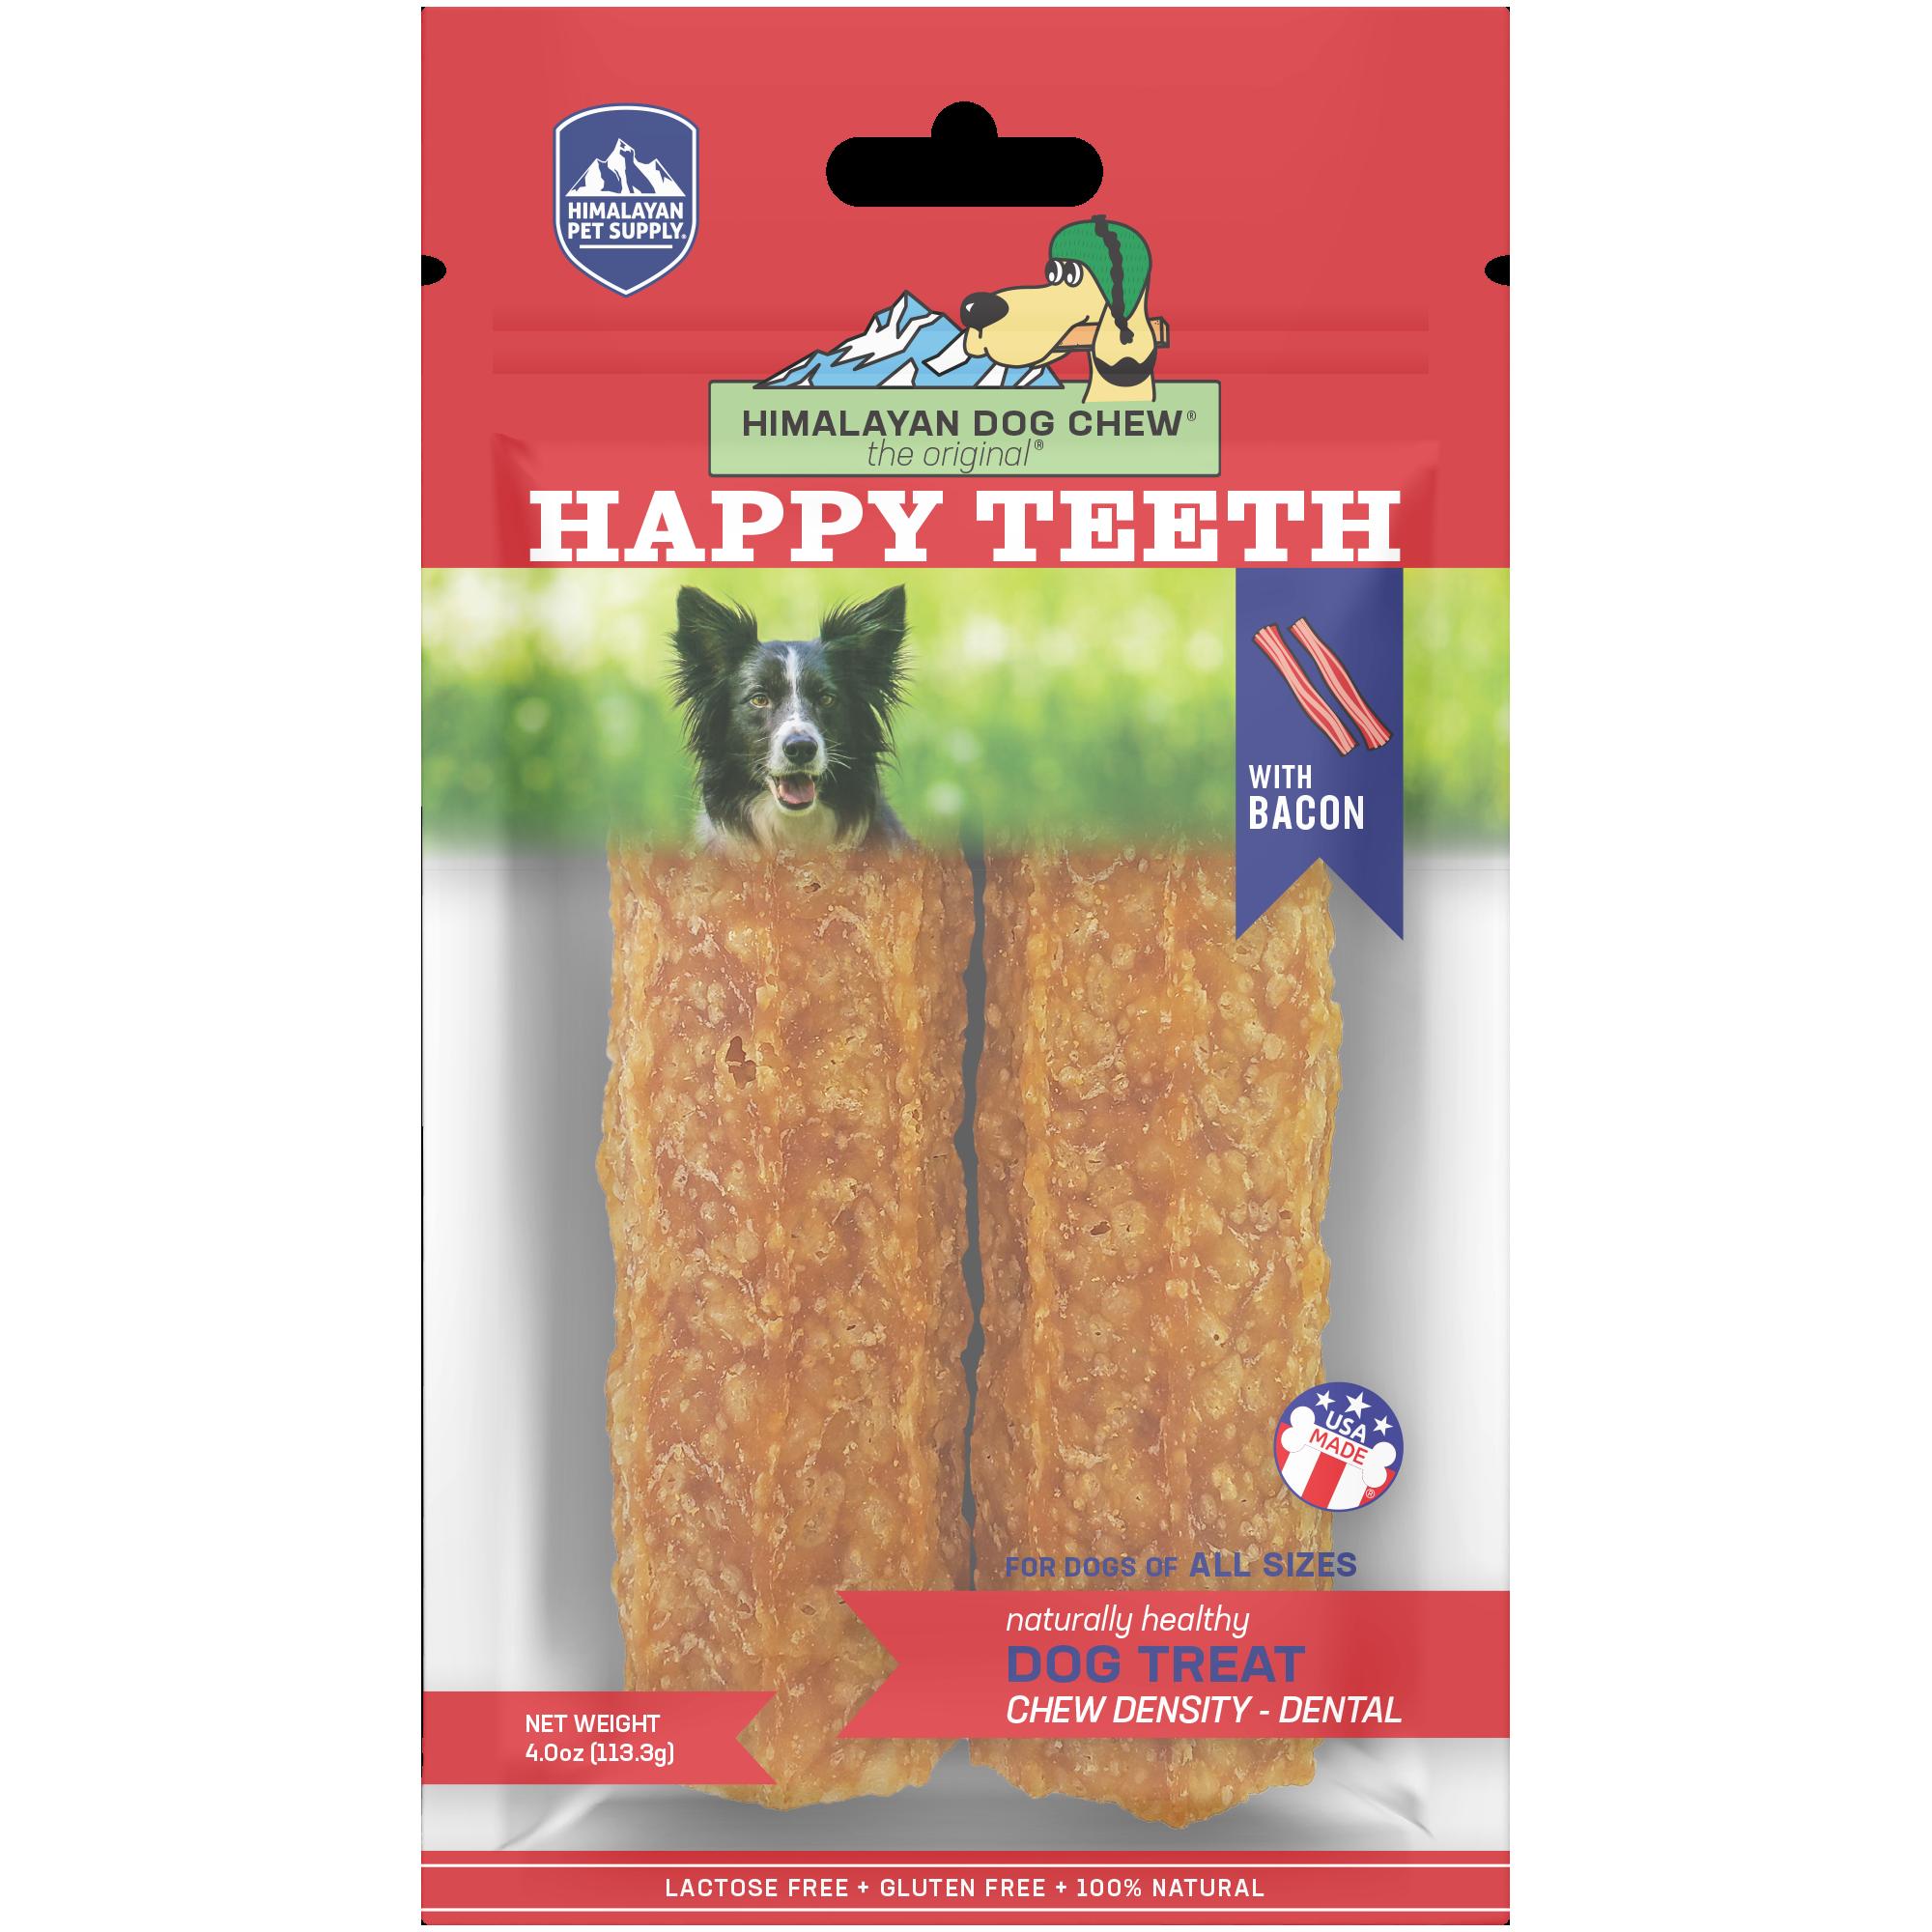 Himalayan Happy Teeth Dental Dog Chew, Bacon, 2 pack